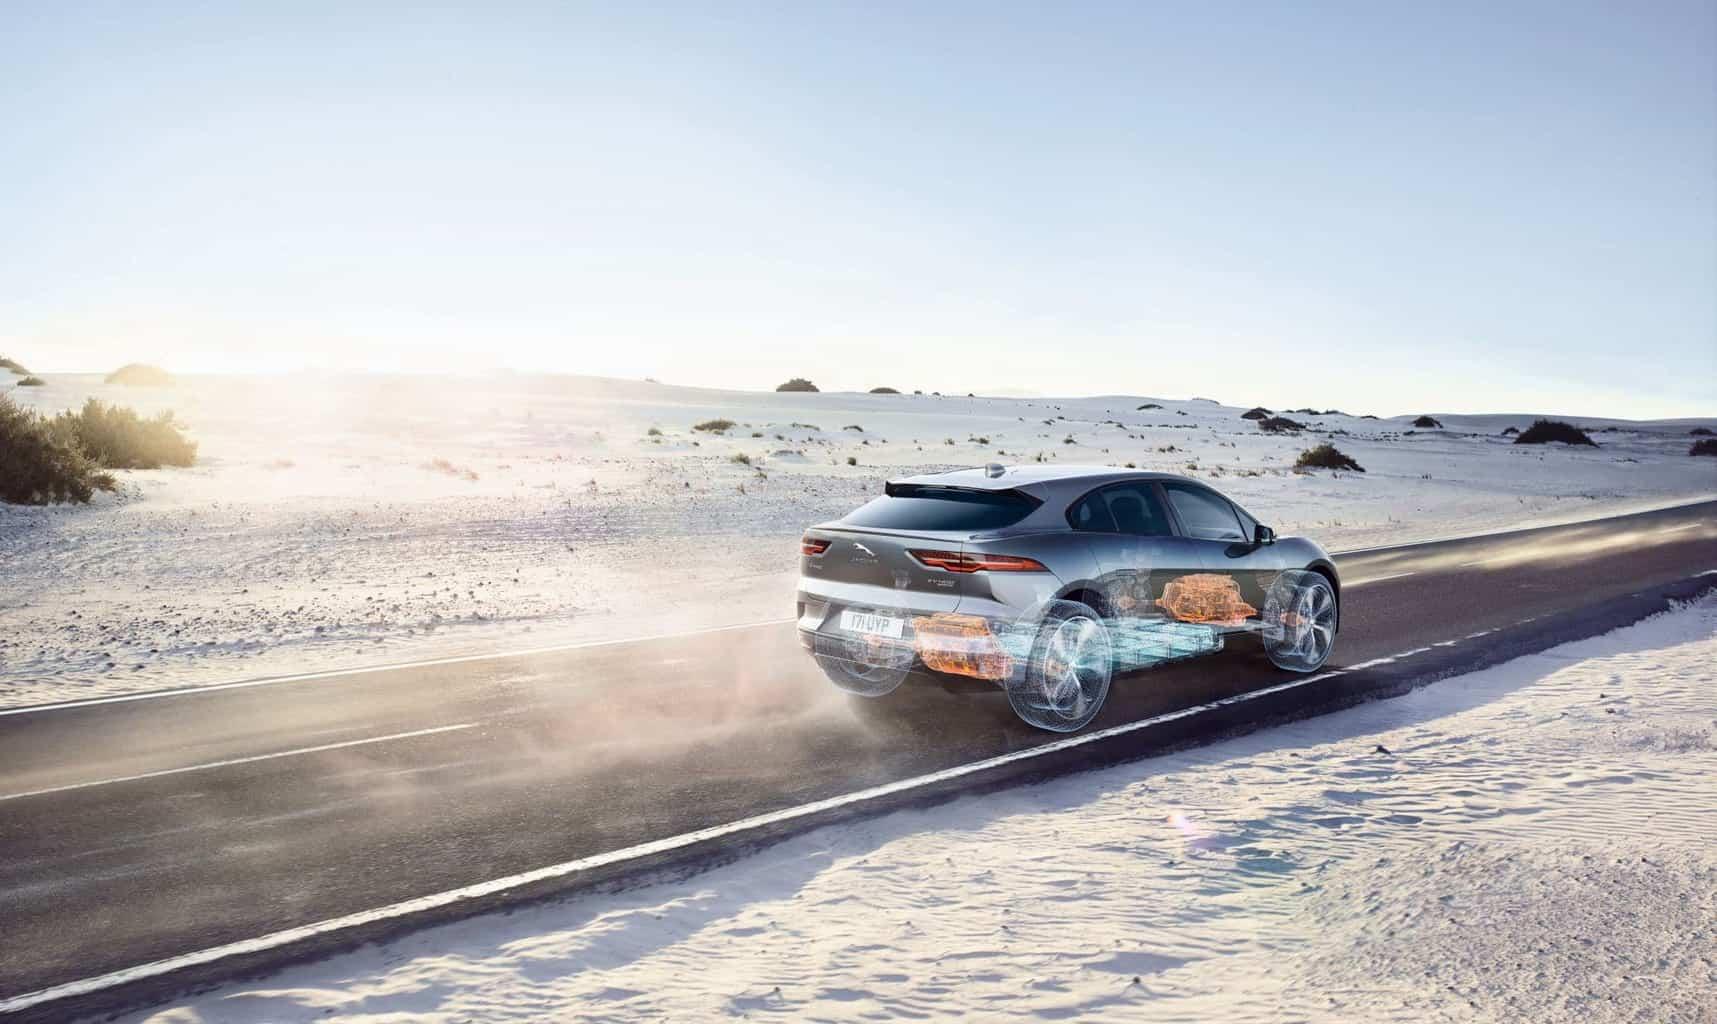 Lieferprobleme bei LG Chem zwingen Jaguar zu Produktionsstop beim I-Pace